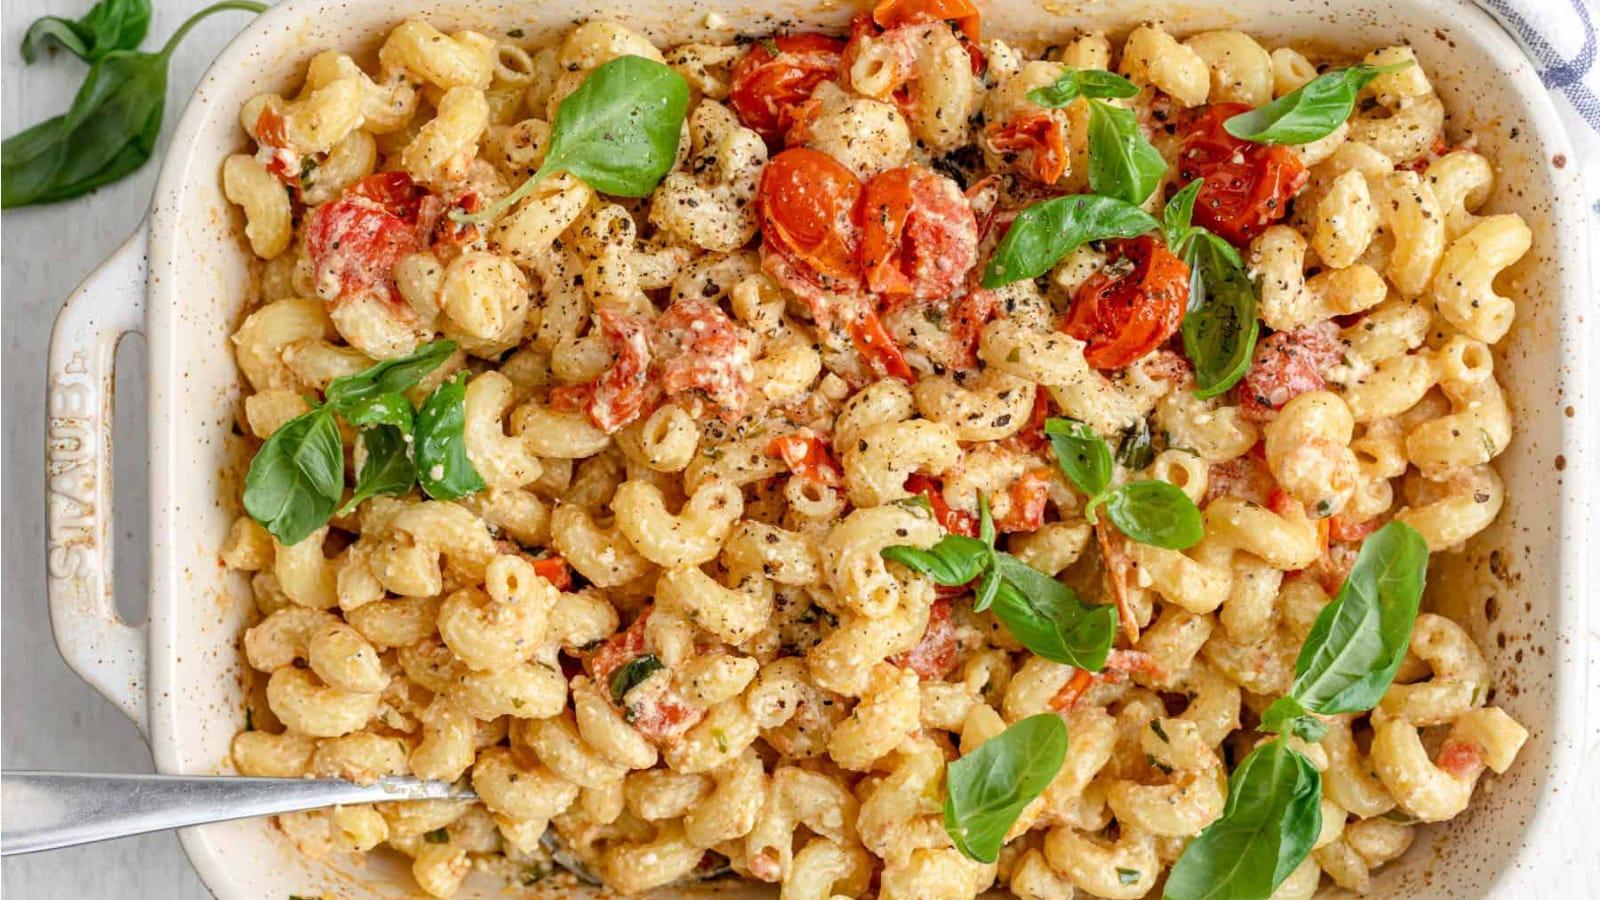 A large Staub casserole dish, filled with cavatappi pasta, fresh basil and cherry tomatoes.